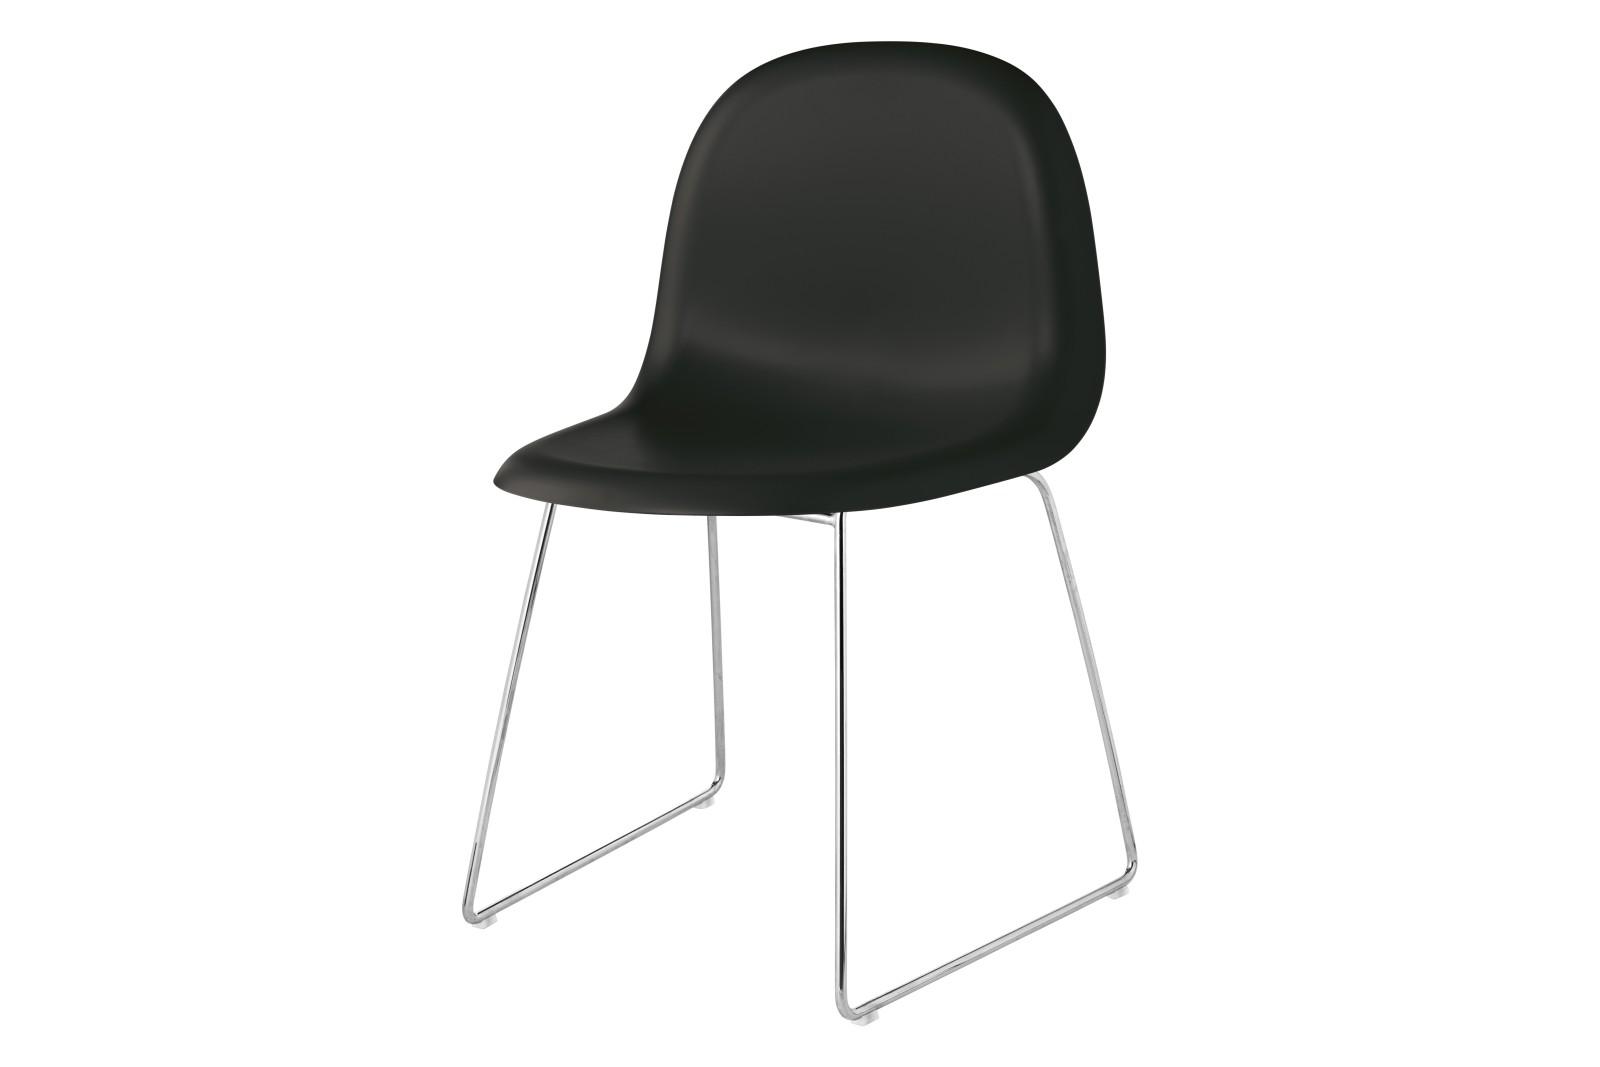 Gubi 3D Dining Chair Sledge Base - Unupholstered Gubi HiRek Black, Gubi Metal Chrome